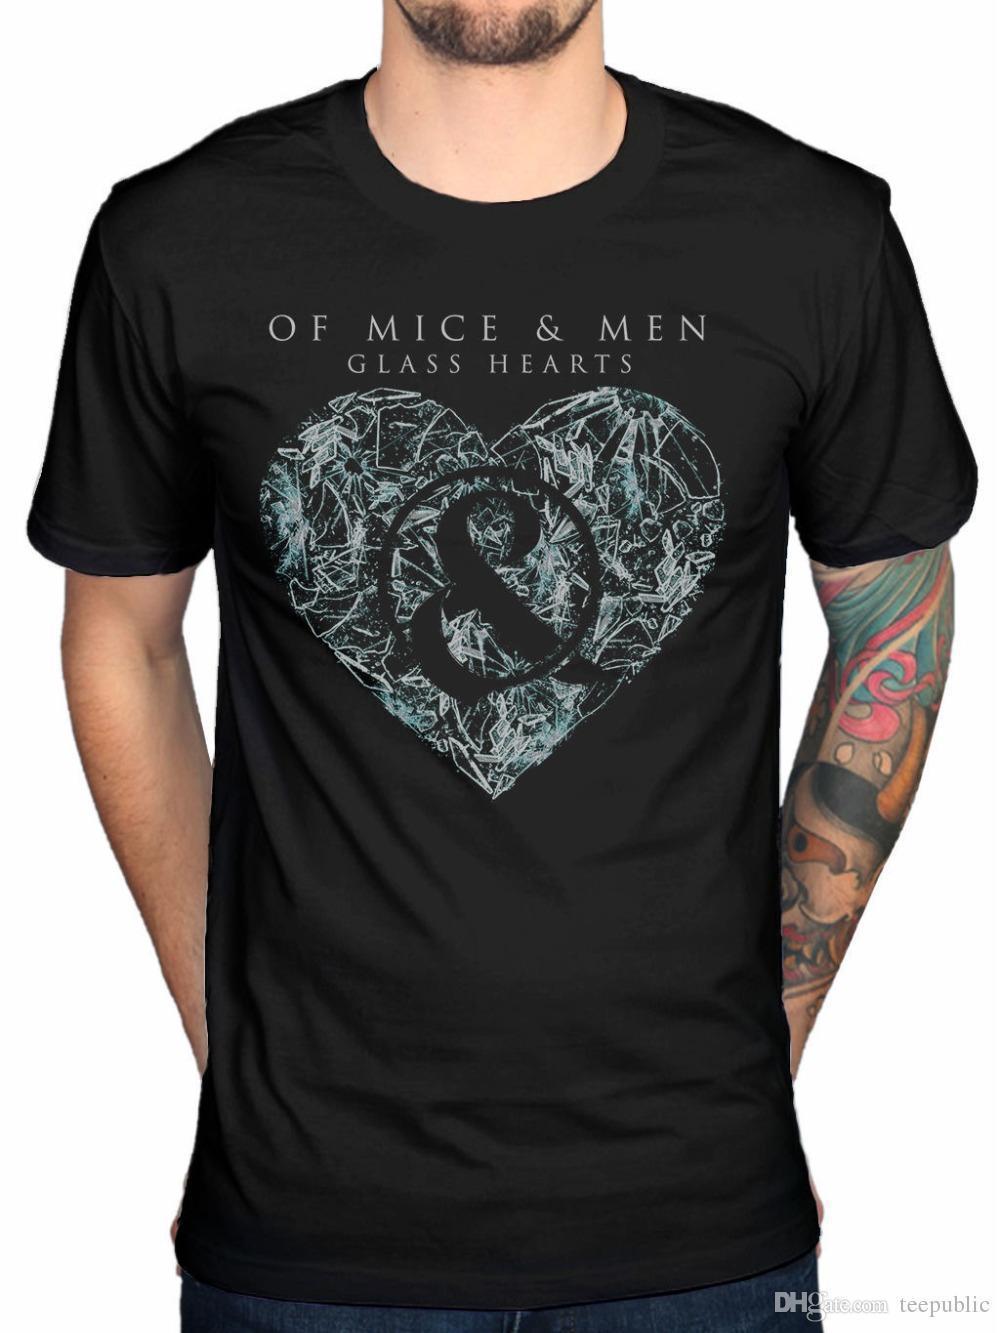 Company T Shirts Print Of Mice Men Glass Hearts Mens T Shirt Black